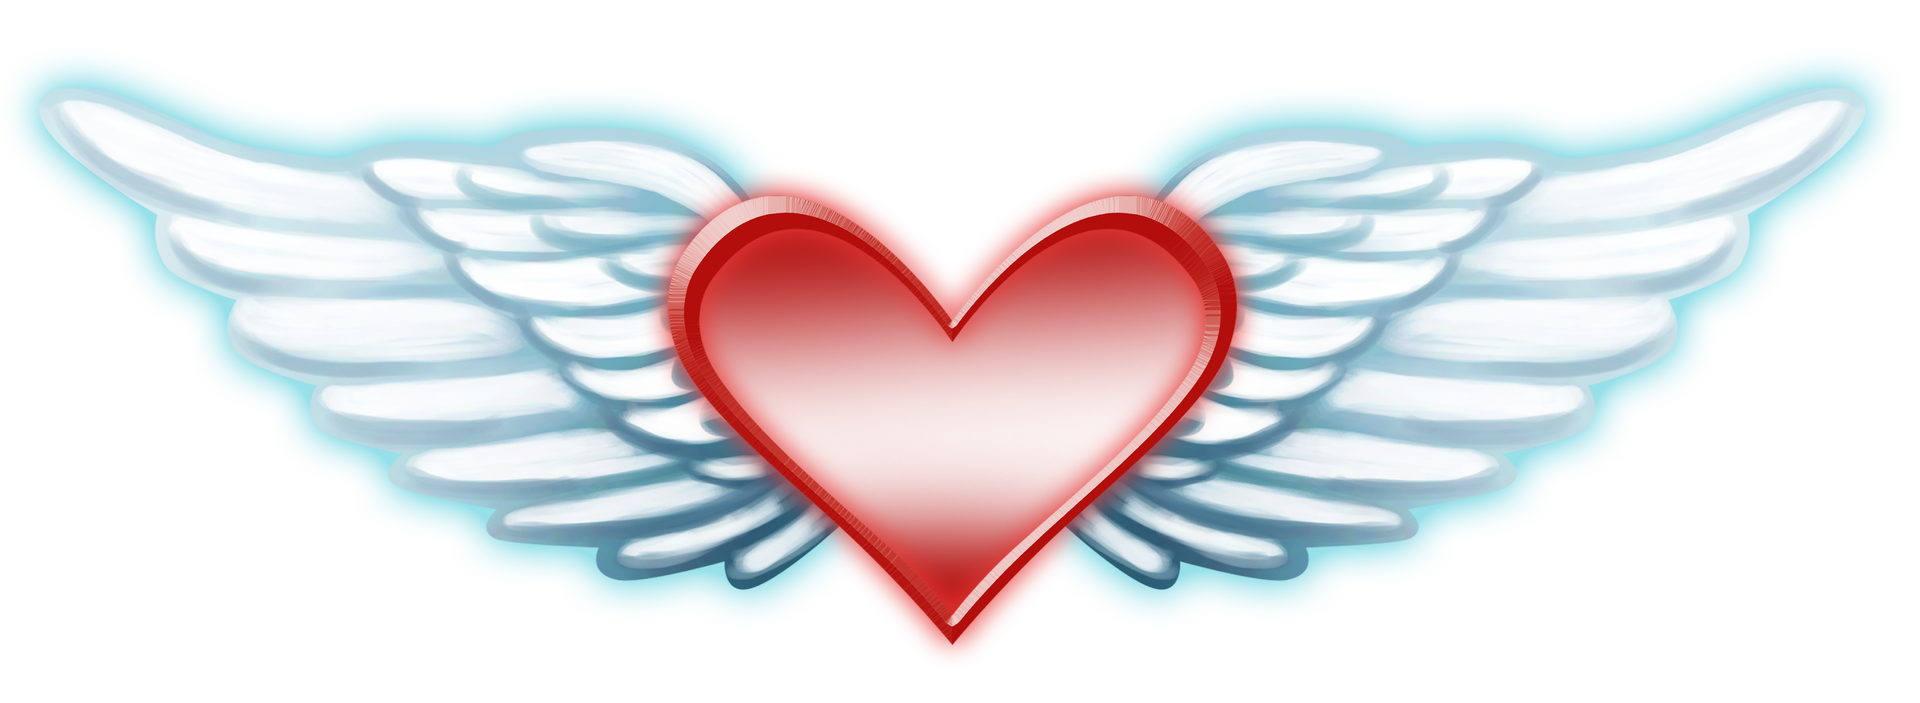 Healed heart clipart png stock Agape Healing Arts - Wild Feminine png stock